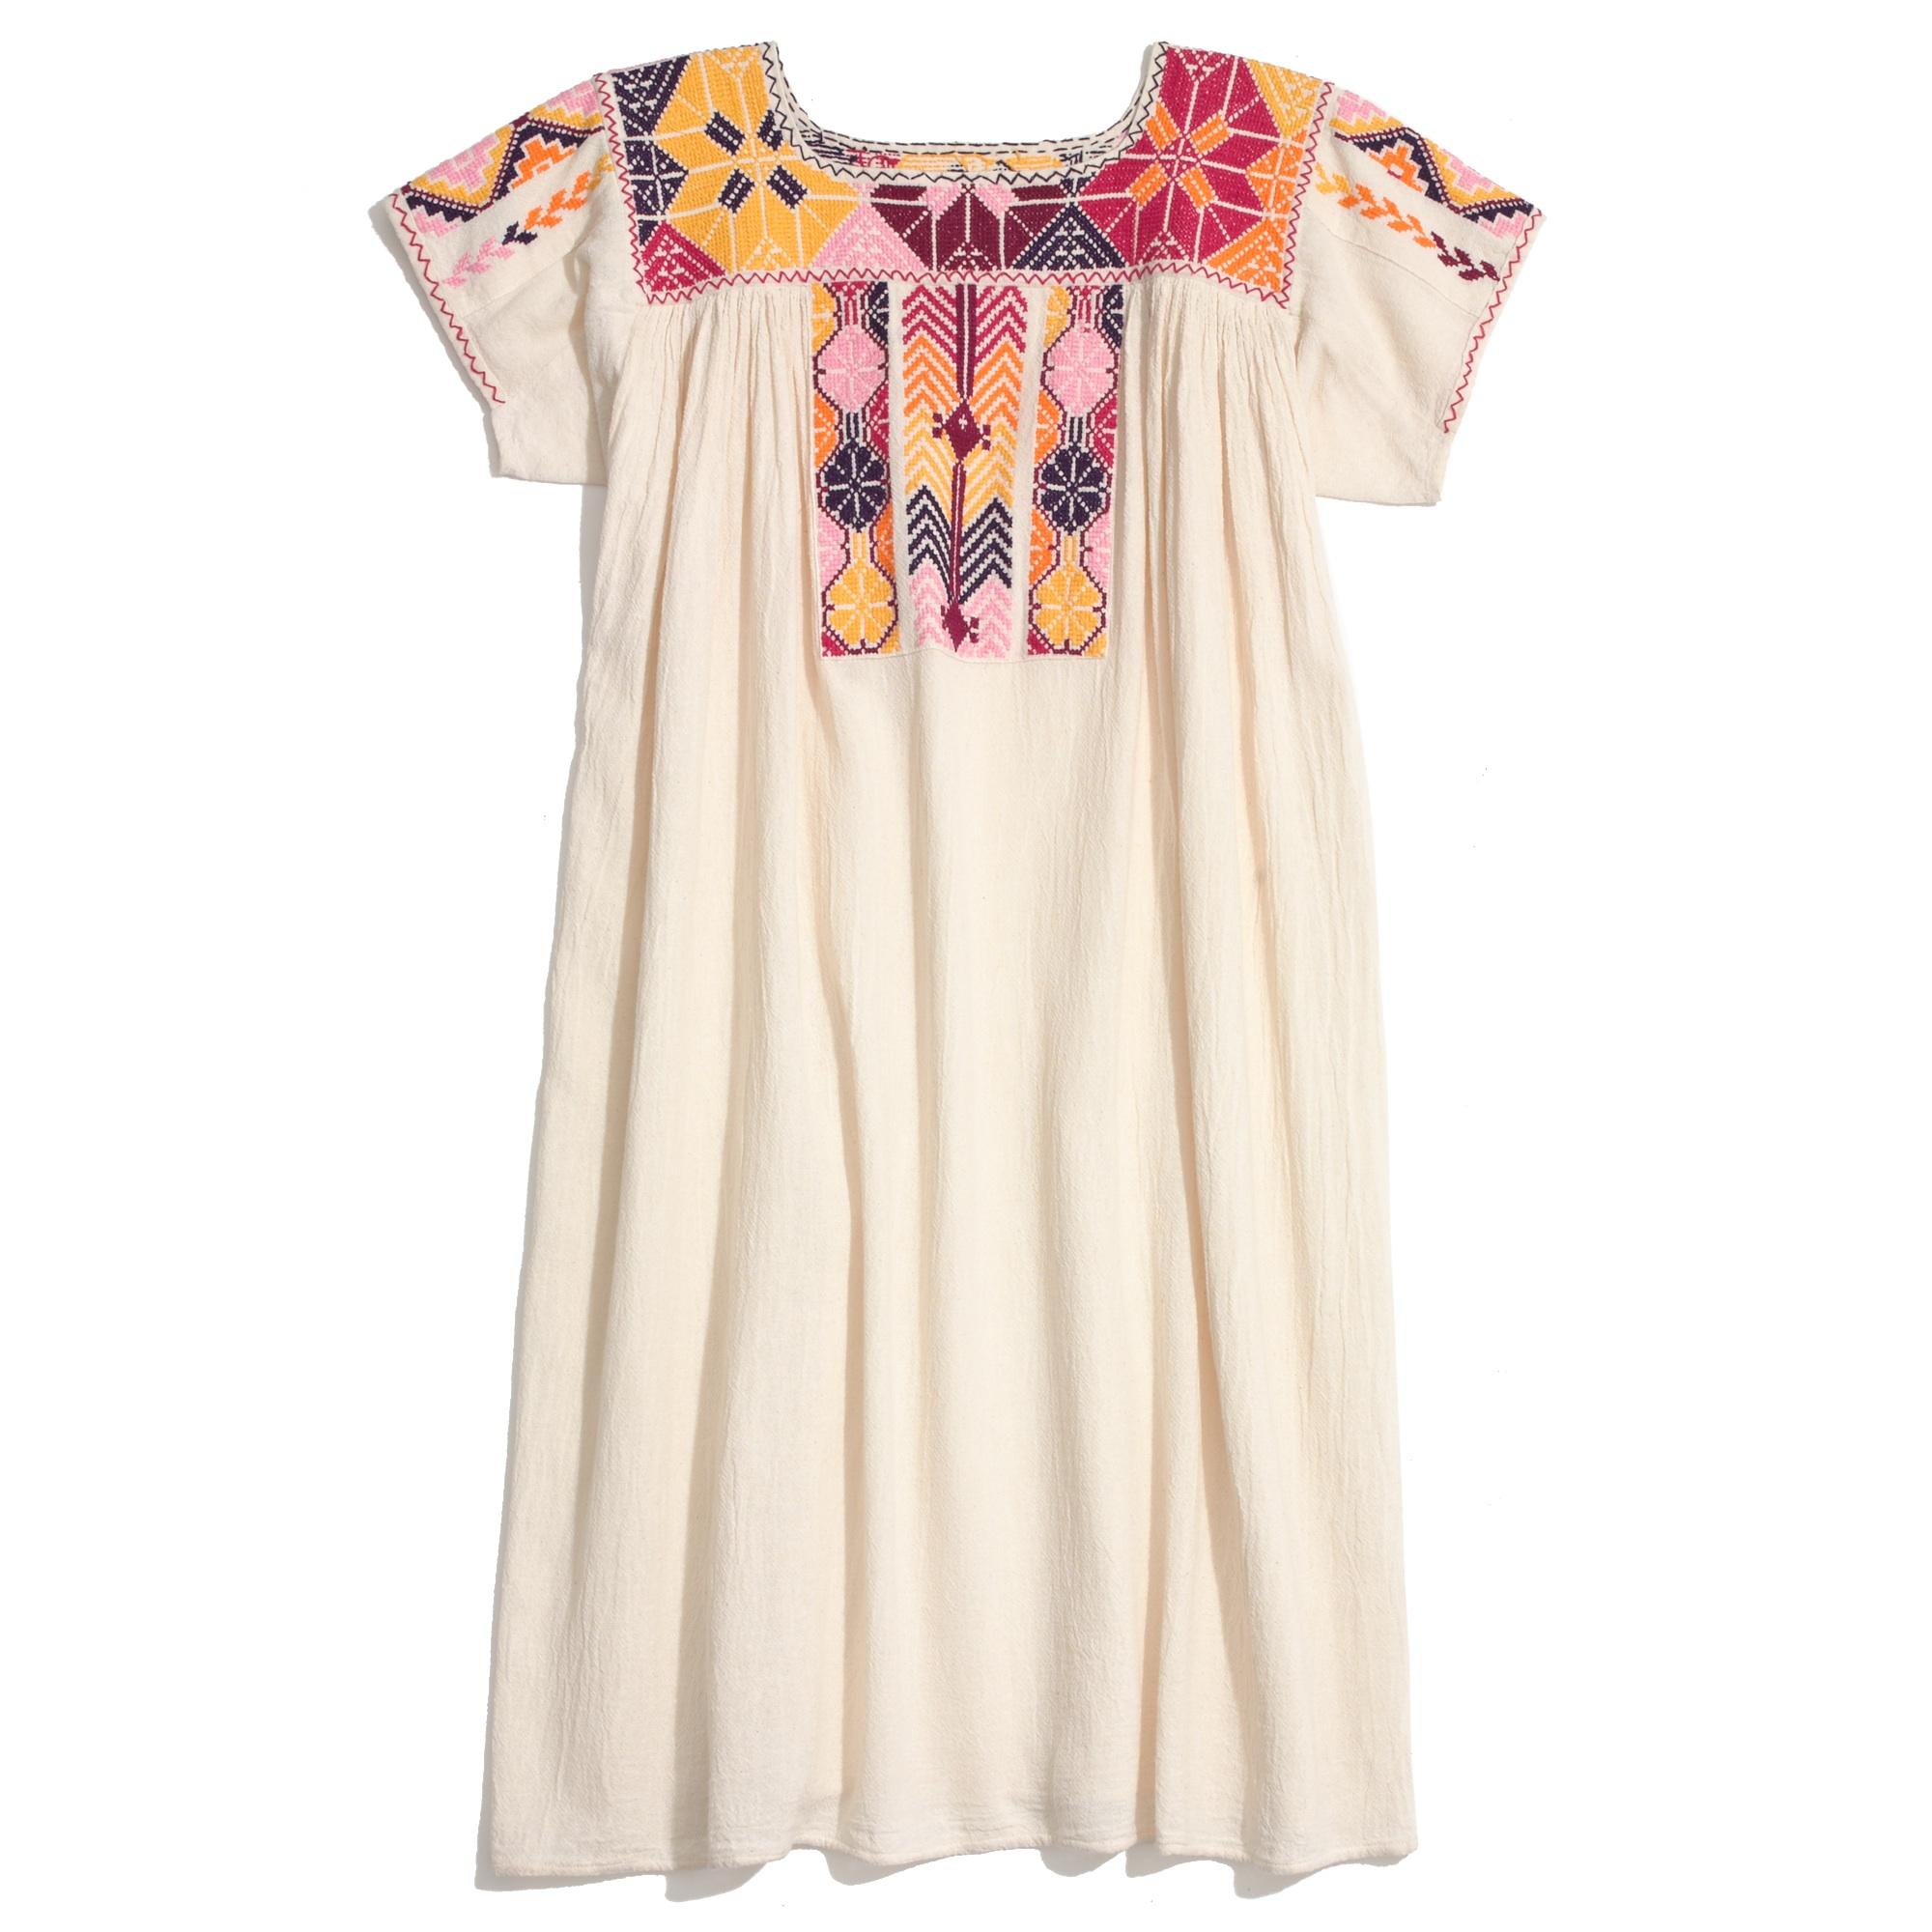 JM Drygoods & TM San Vicente Dress